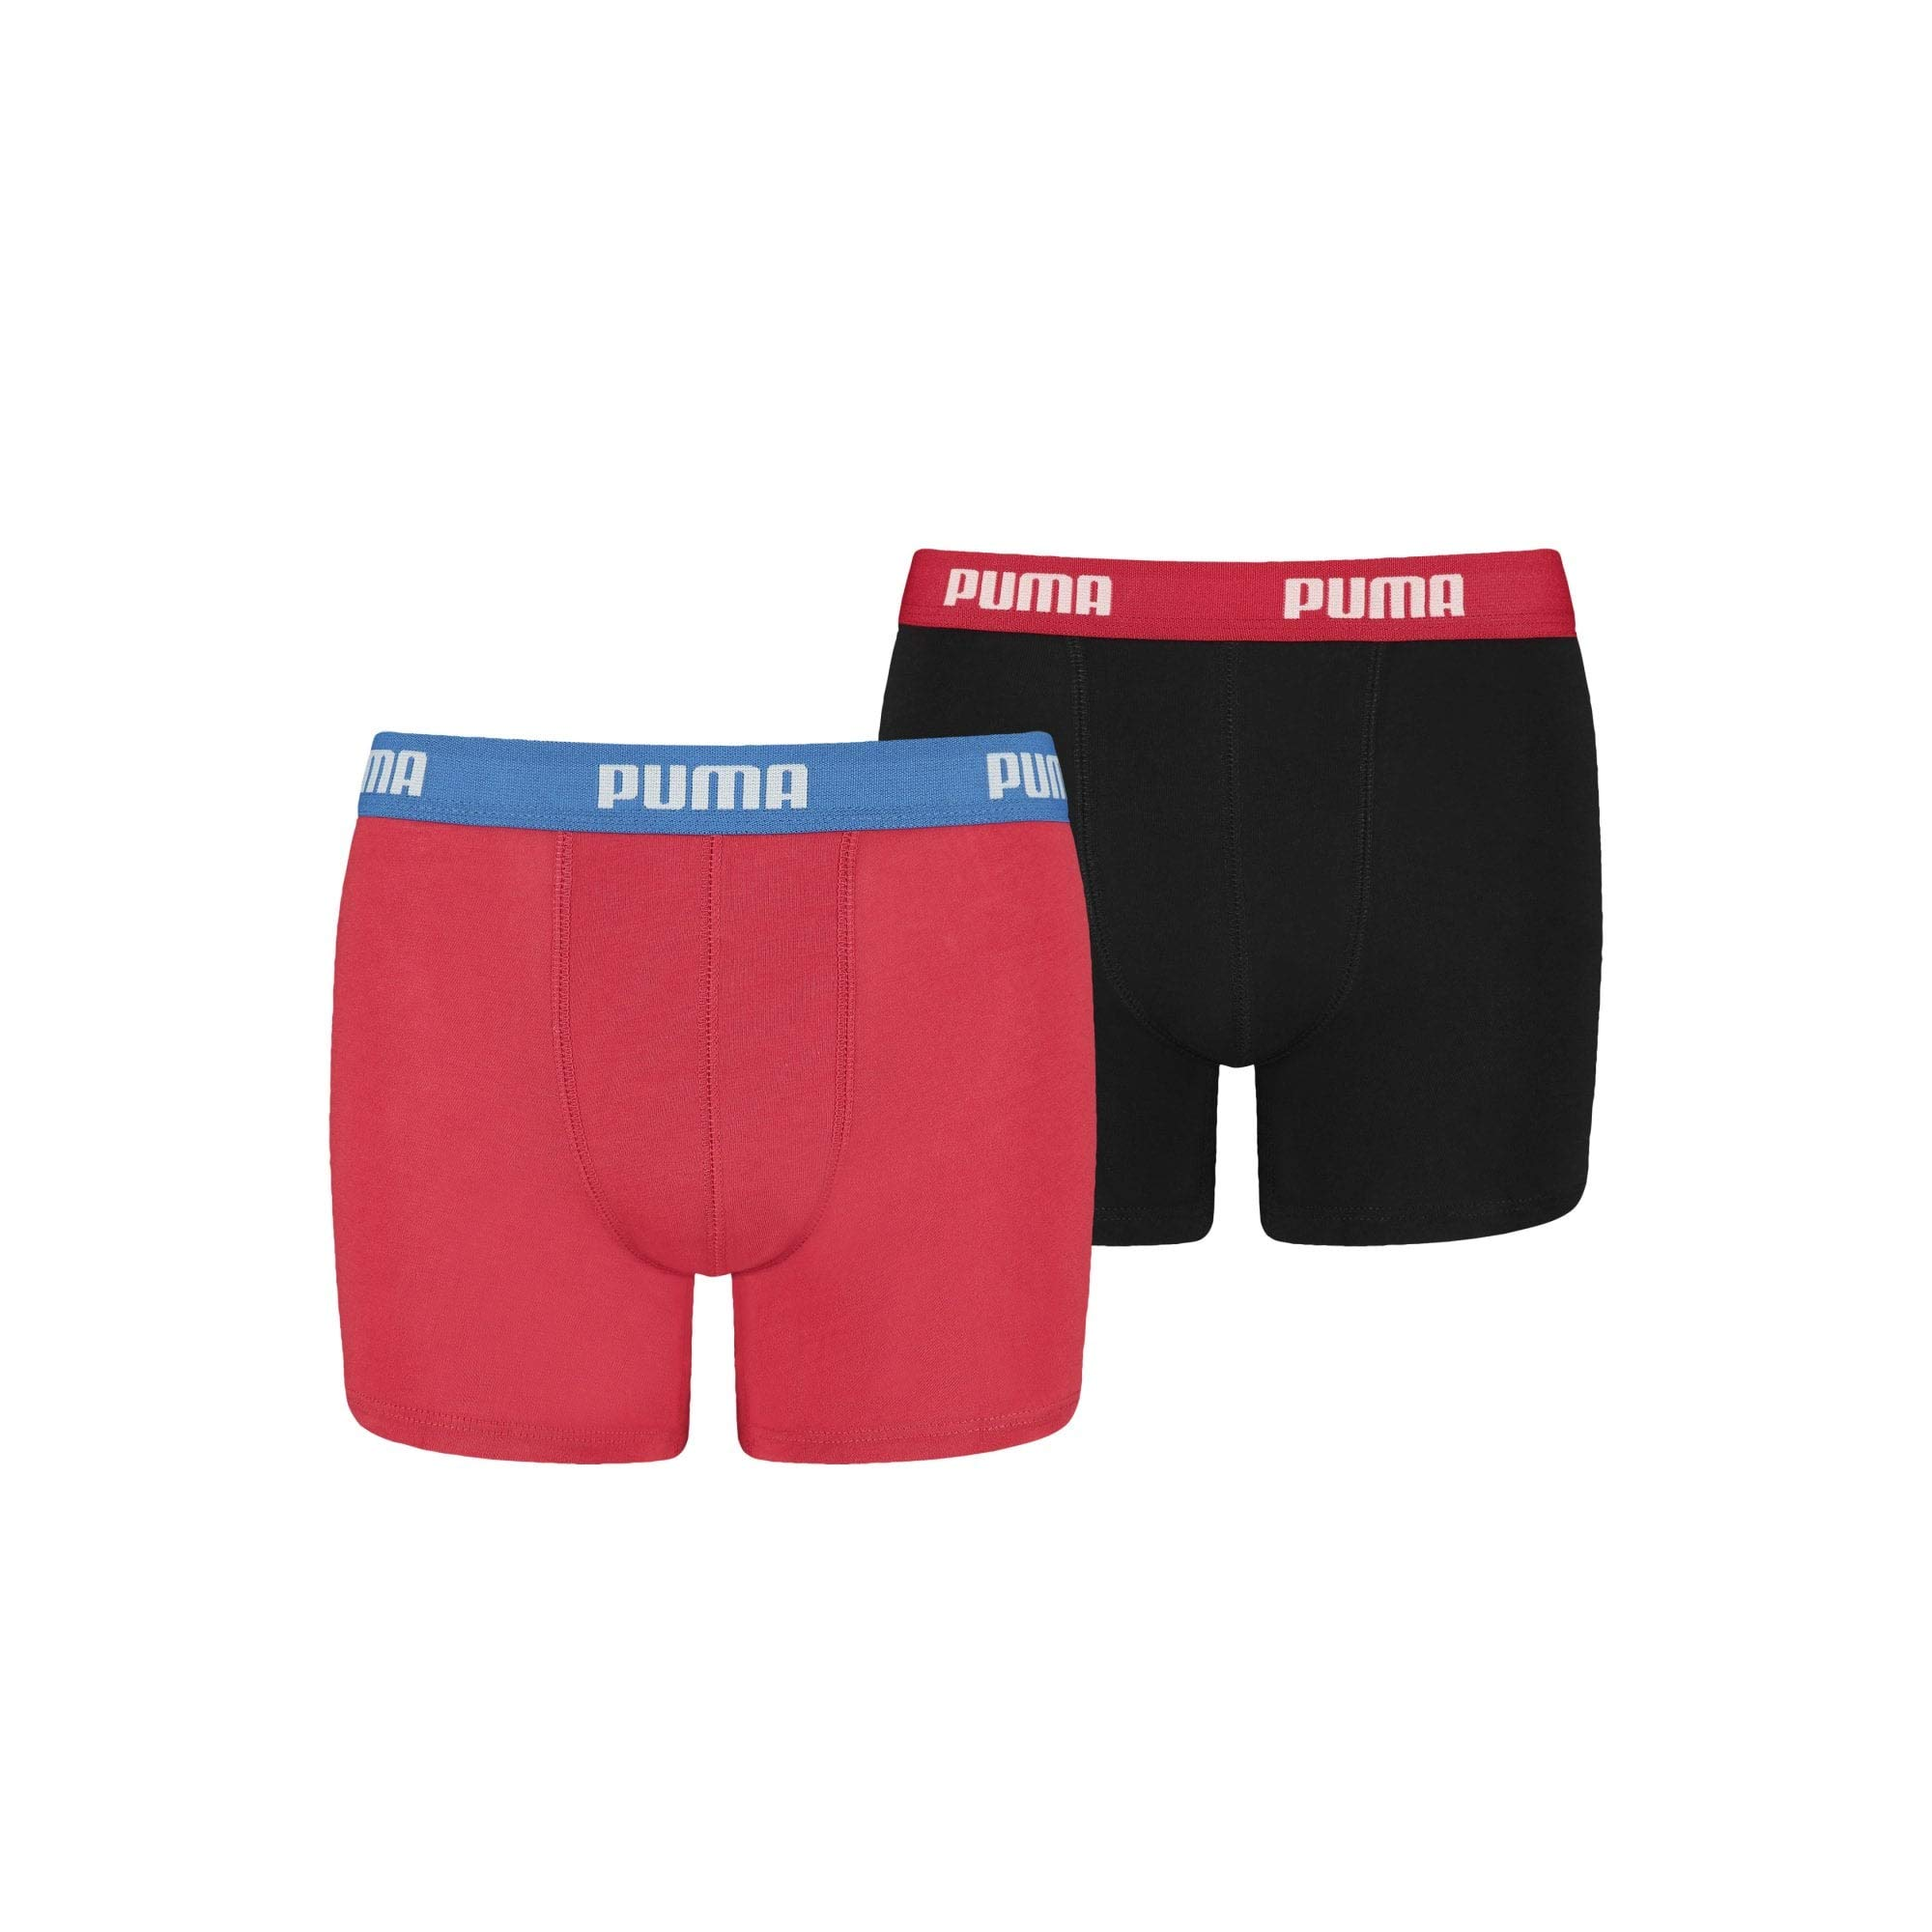 PUMA Boy's 2-Pack 360 Logo Boys Boxer Briefs, Red/Black Age 11-12 Red/Black